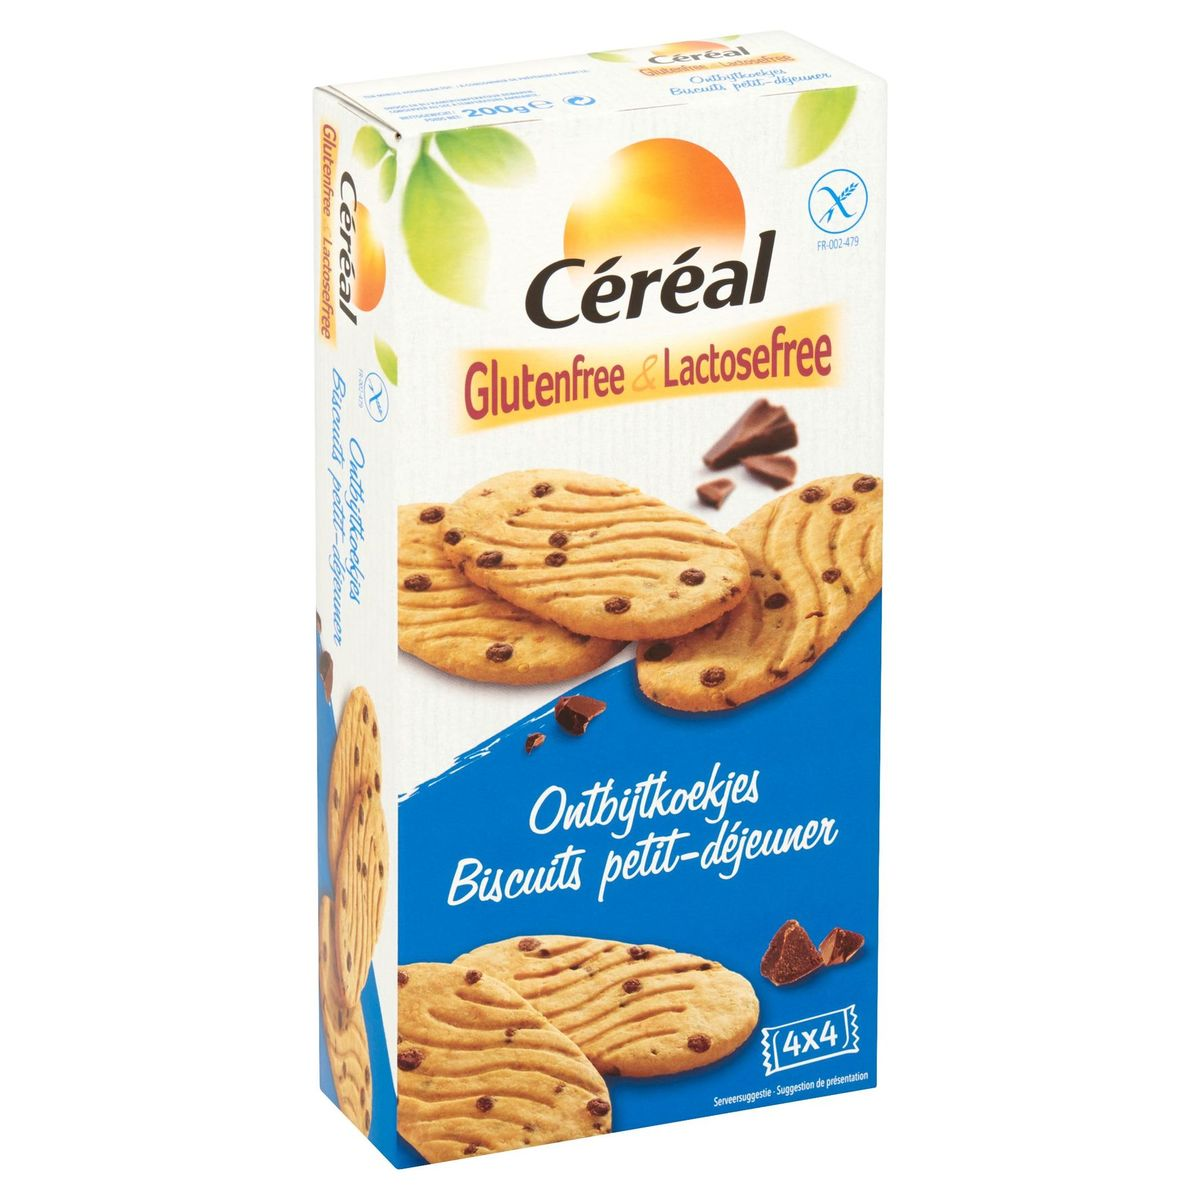 Céréal Glutenfree & Lactosefree  Petit-Déjeuner 4x4 Pièces 200g